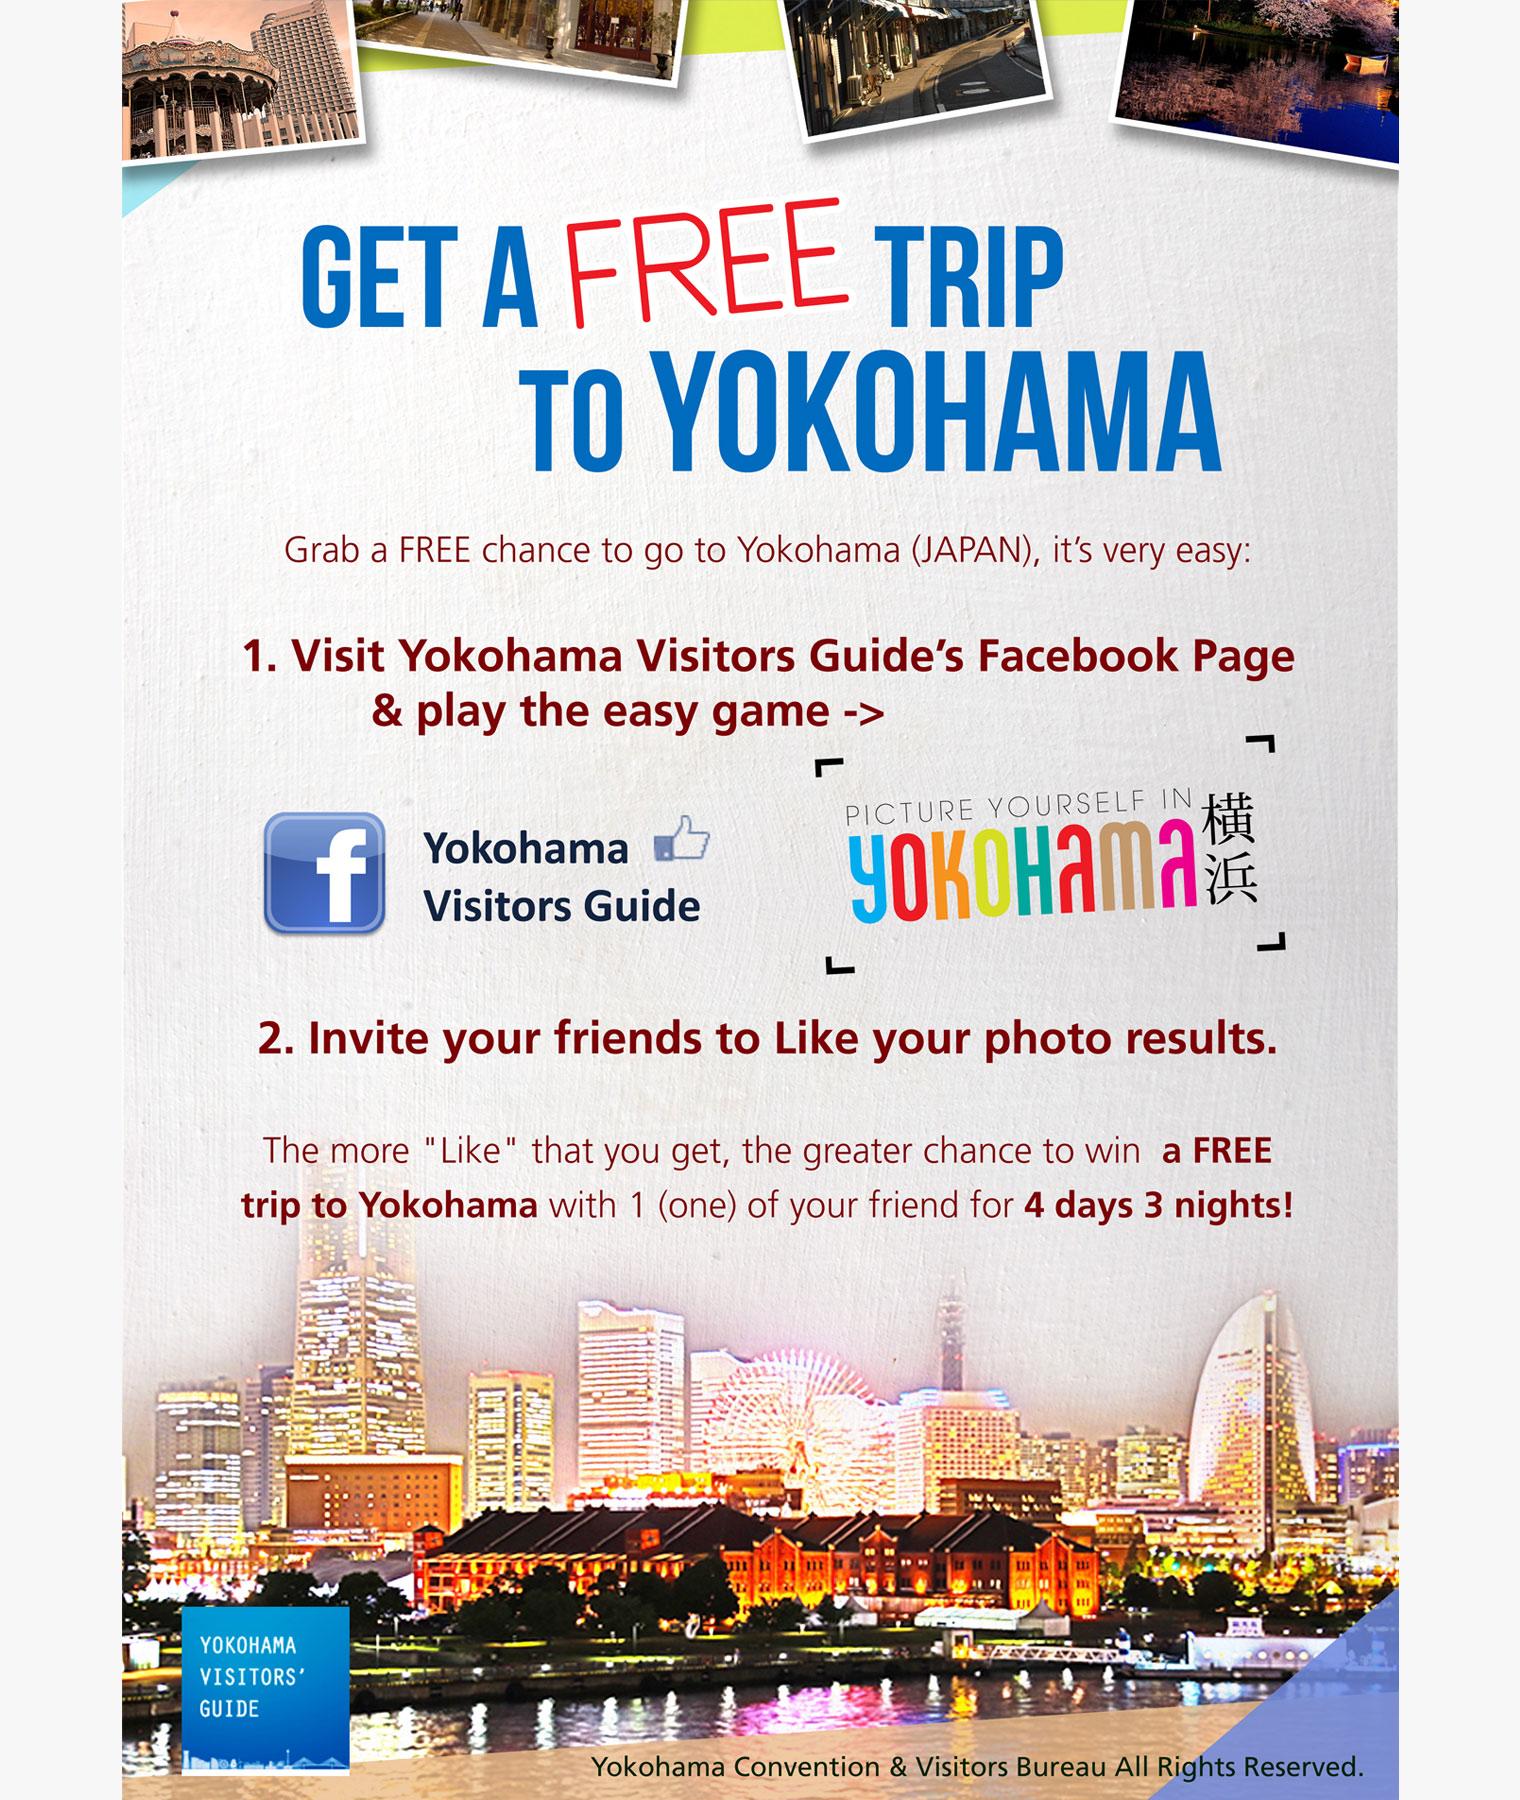 Yokohama Convention & Visitors Bureau